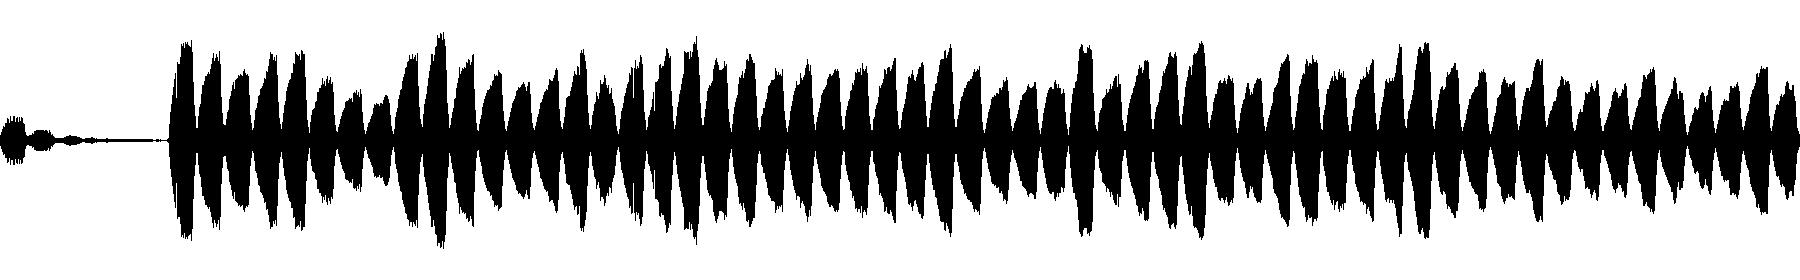 ct2 120 am mono synth tremors